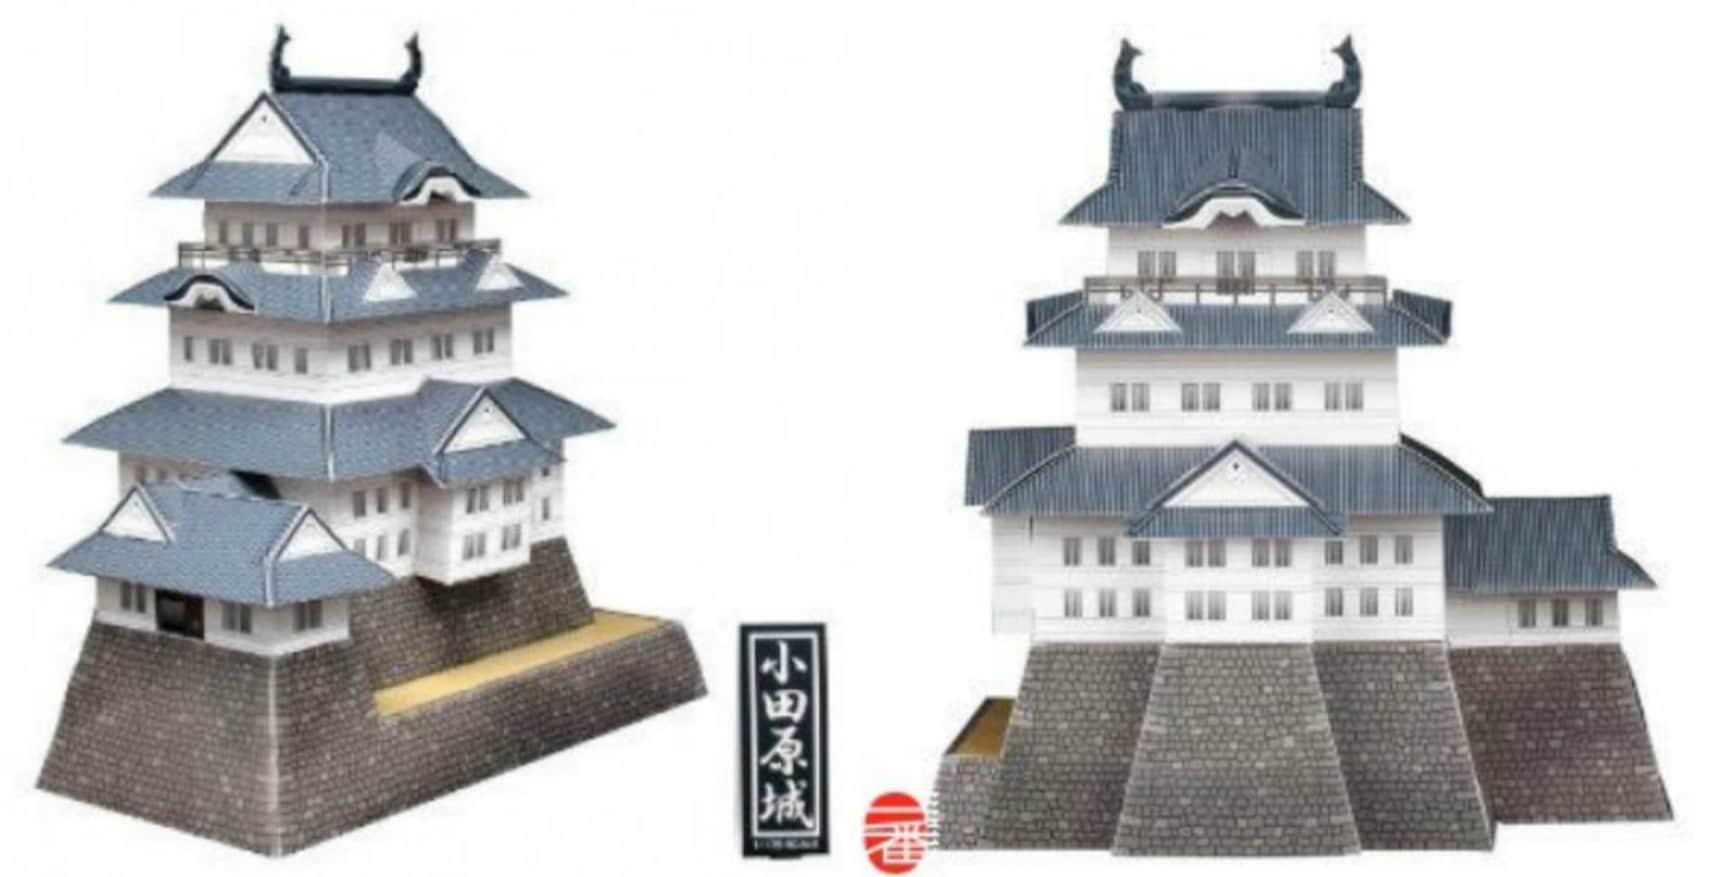 Get a 3-D Puzzle of Odawara Castle